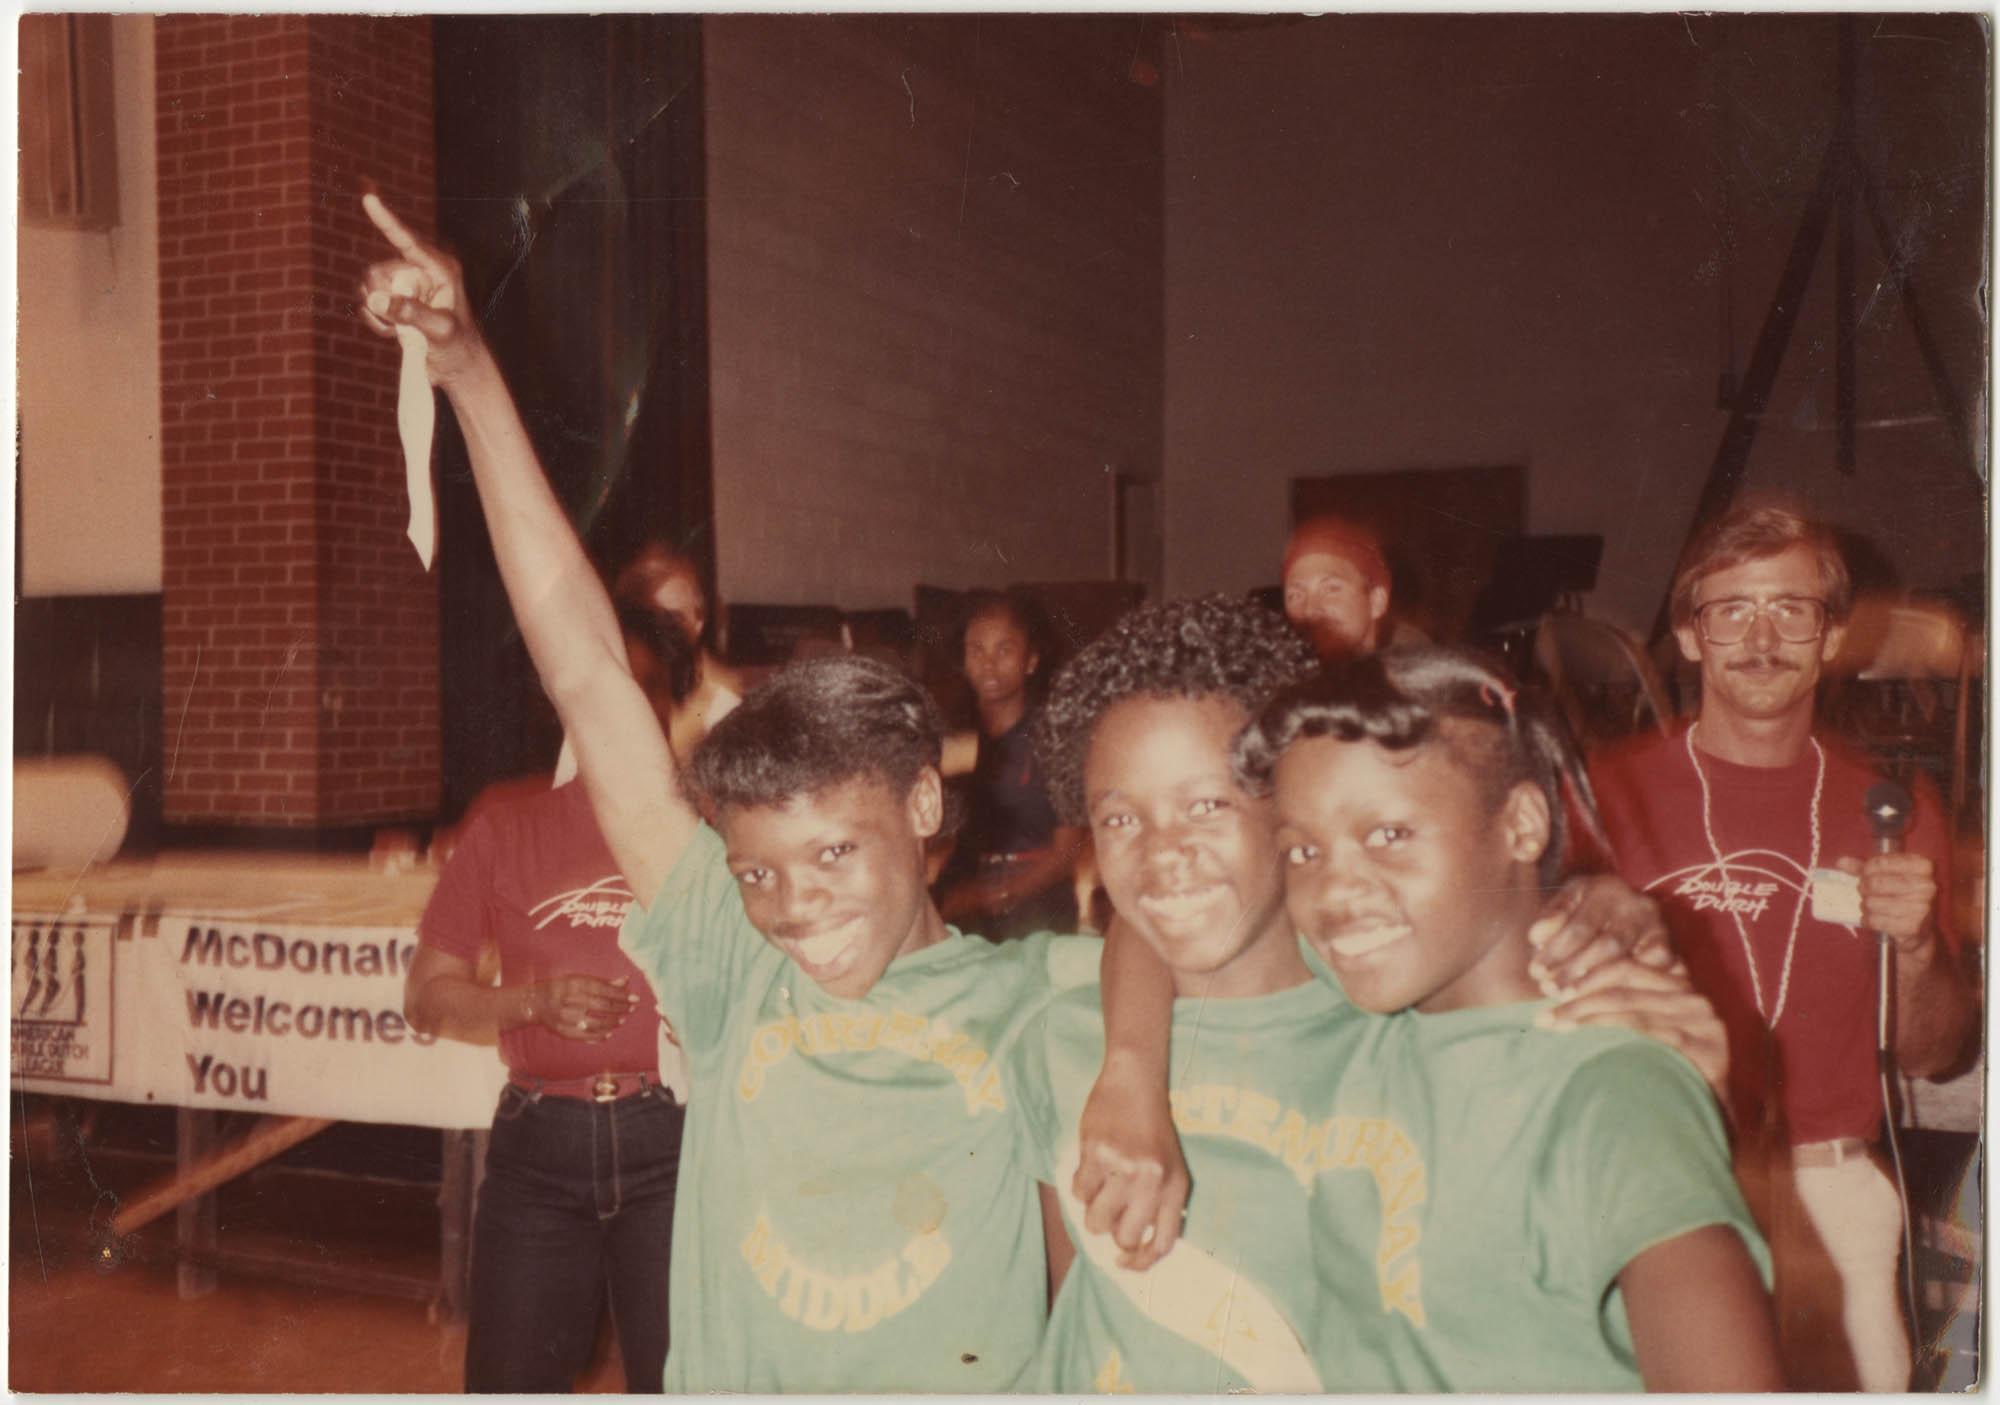 Photograph of Three Girls